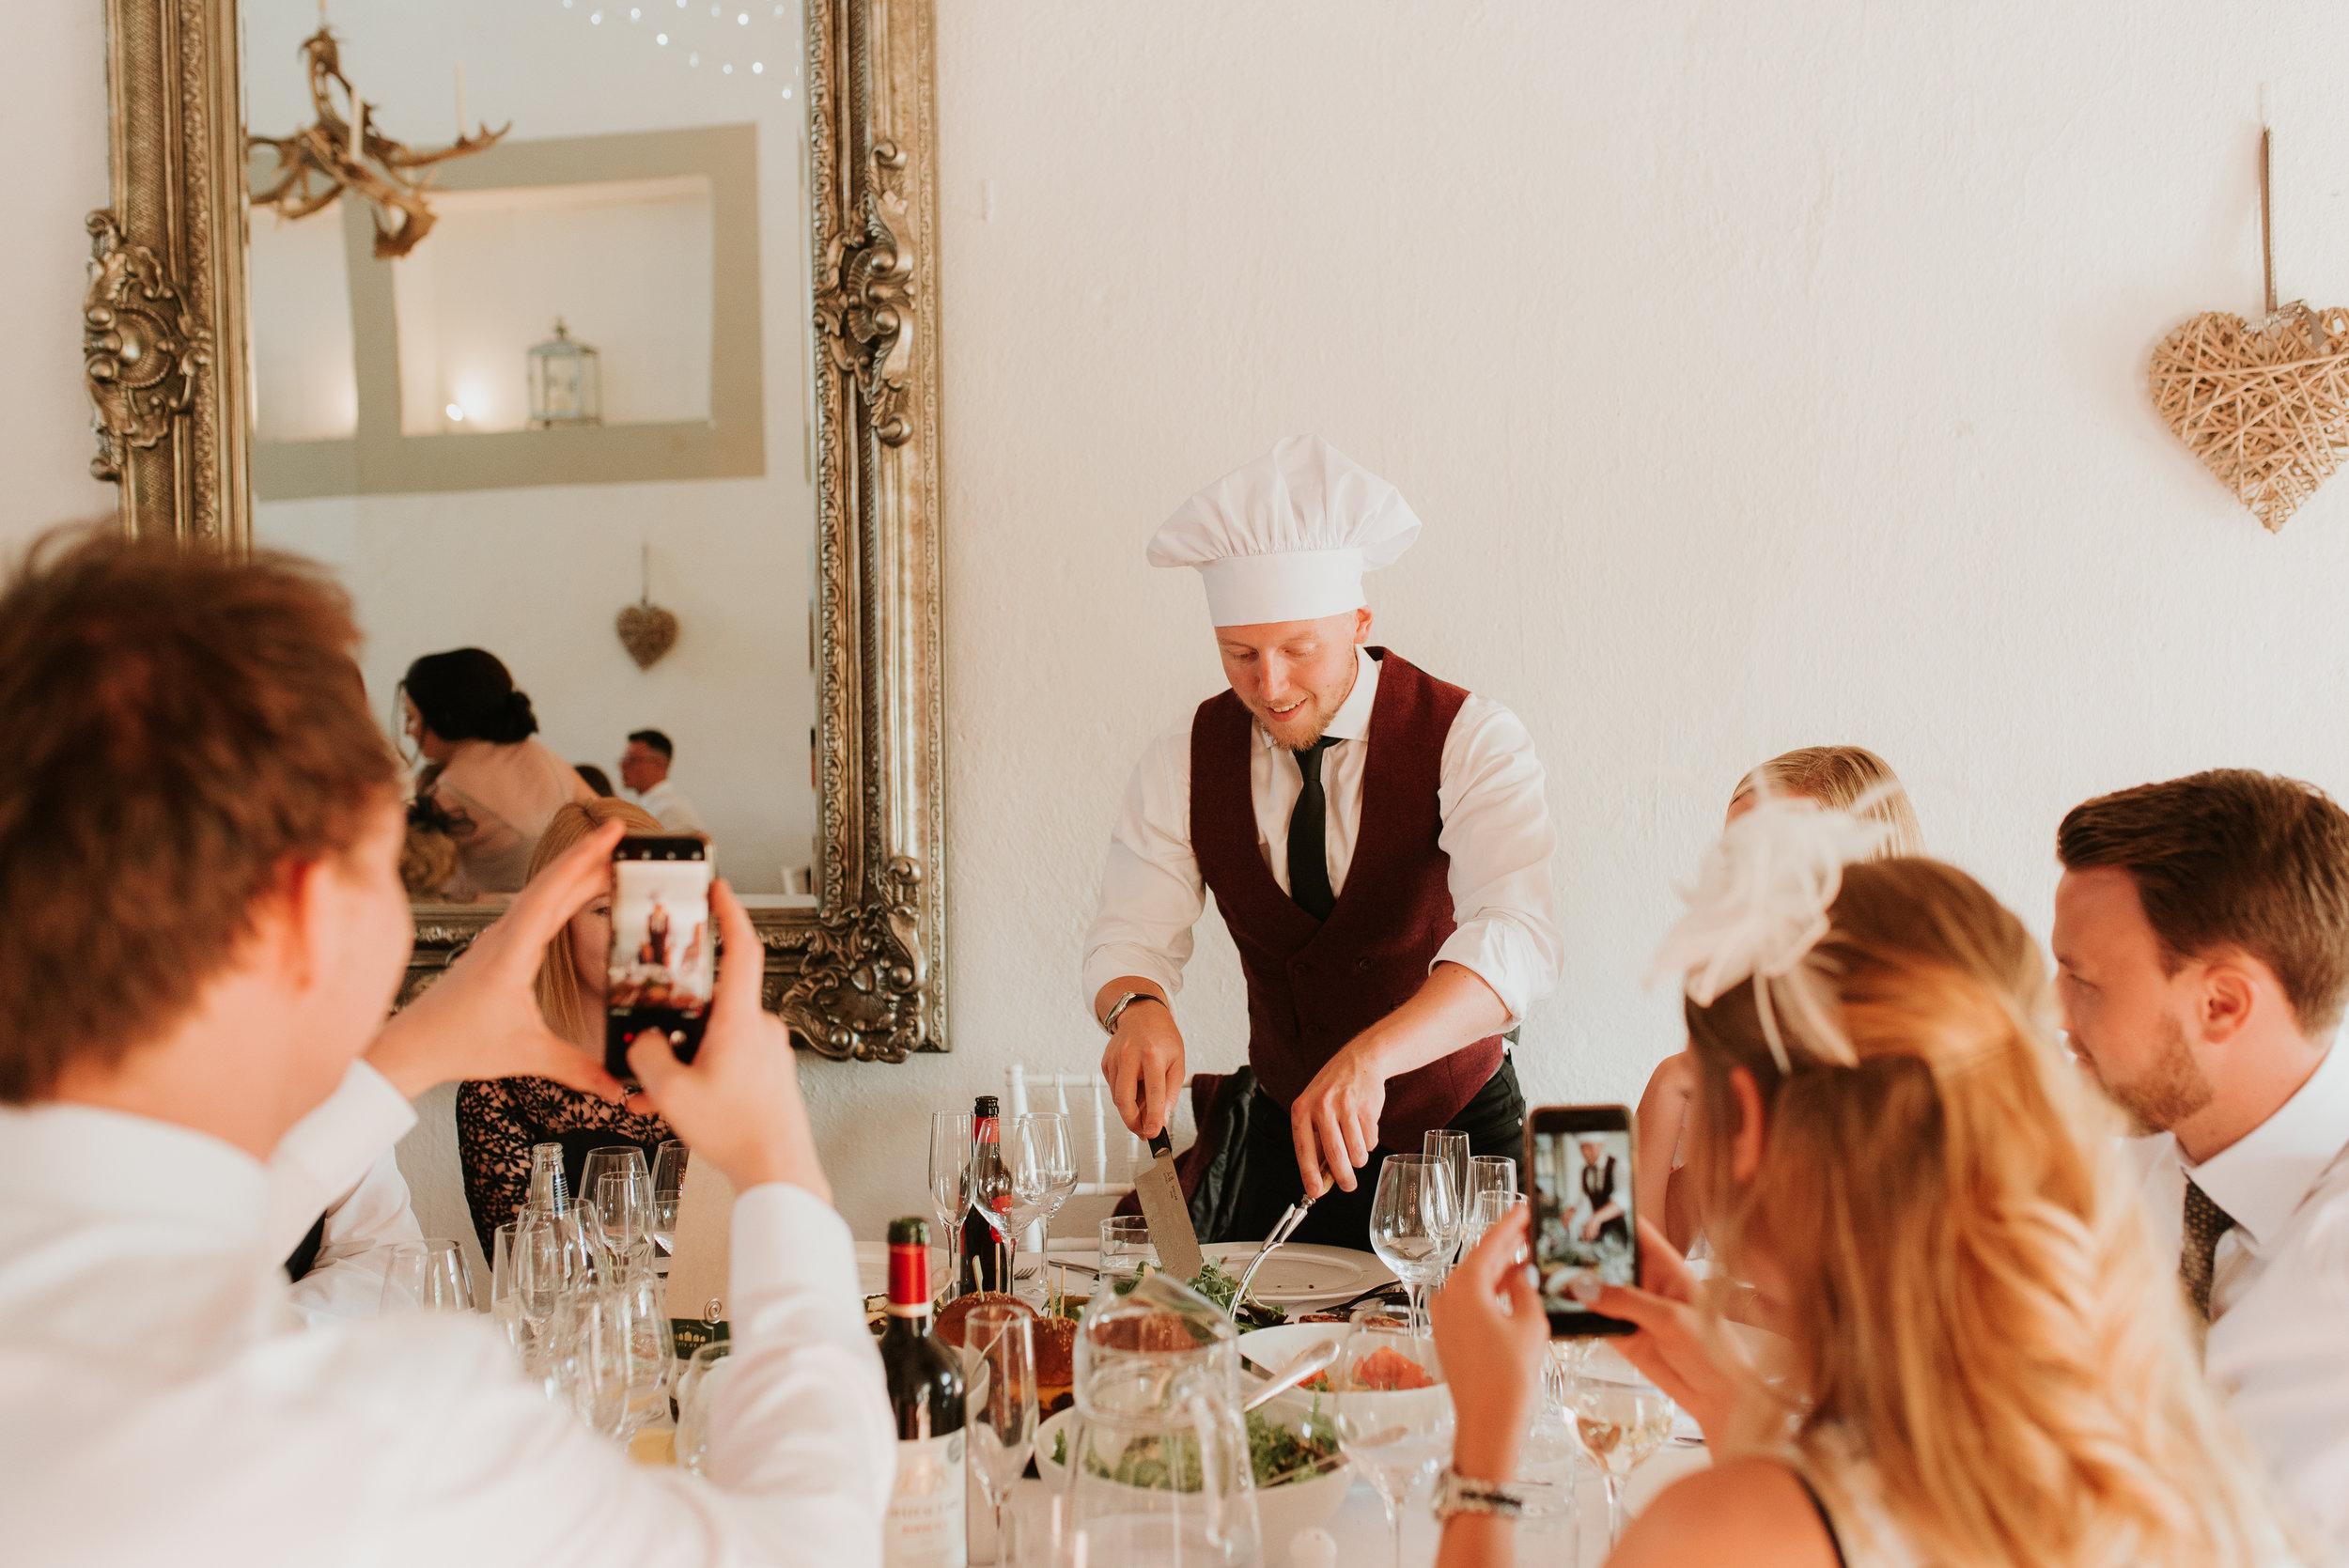 Oxfordshire-wedding-photographer-64.jpg